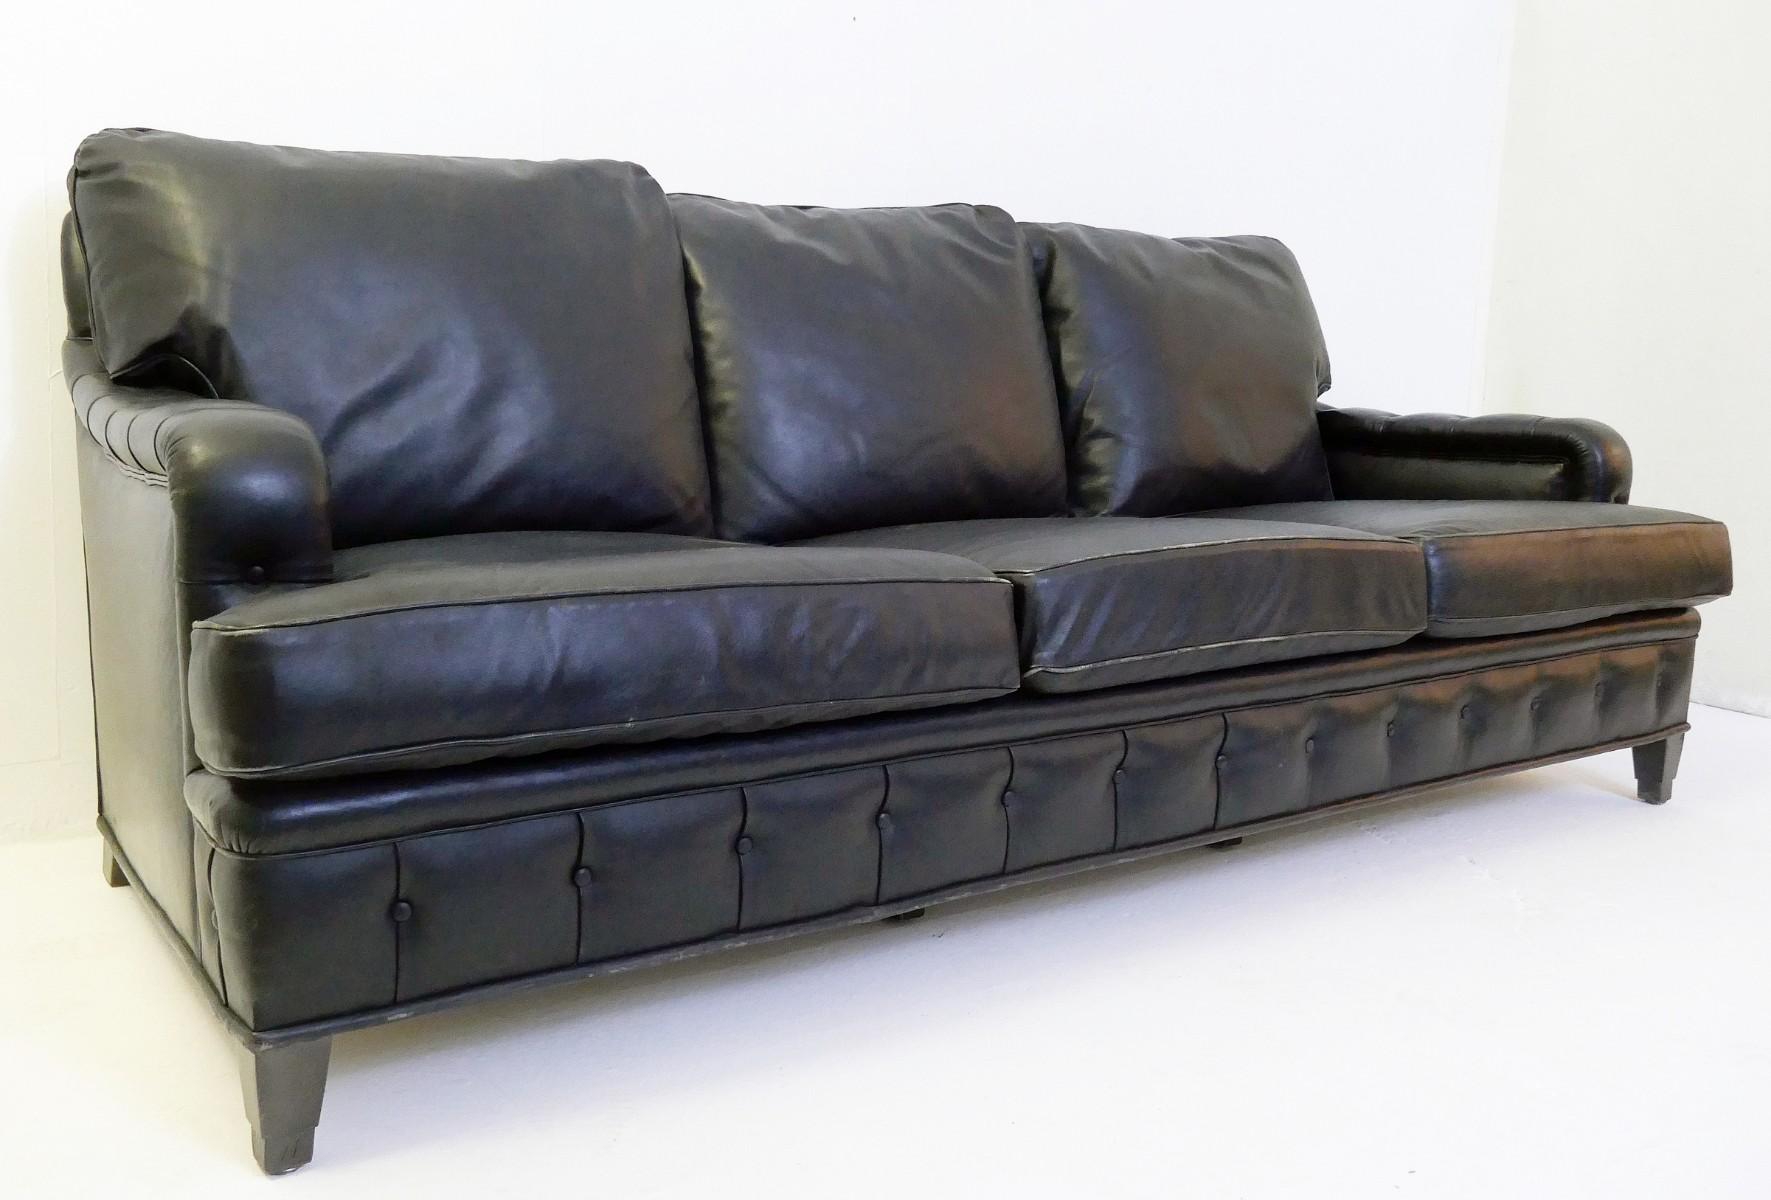 3 seater black leather sofa - Sofa - Seating - Via Antica